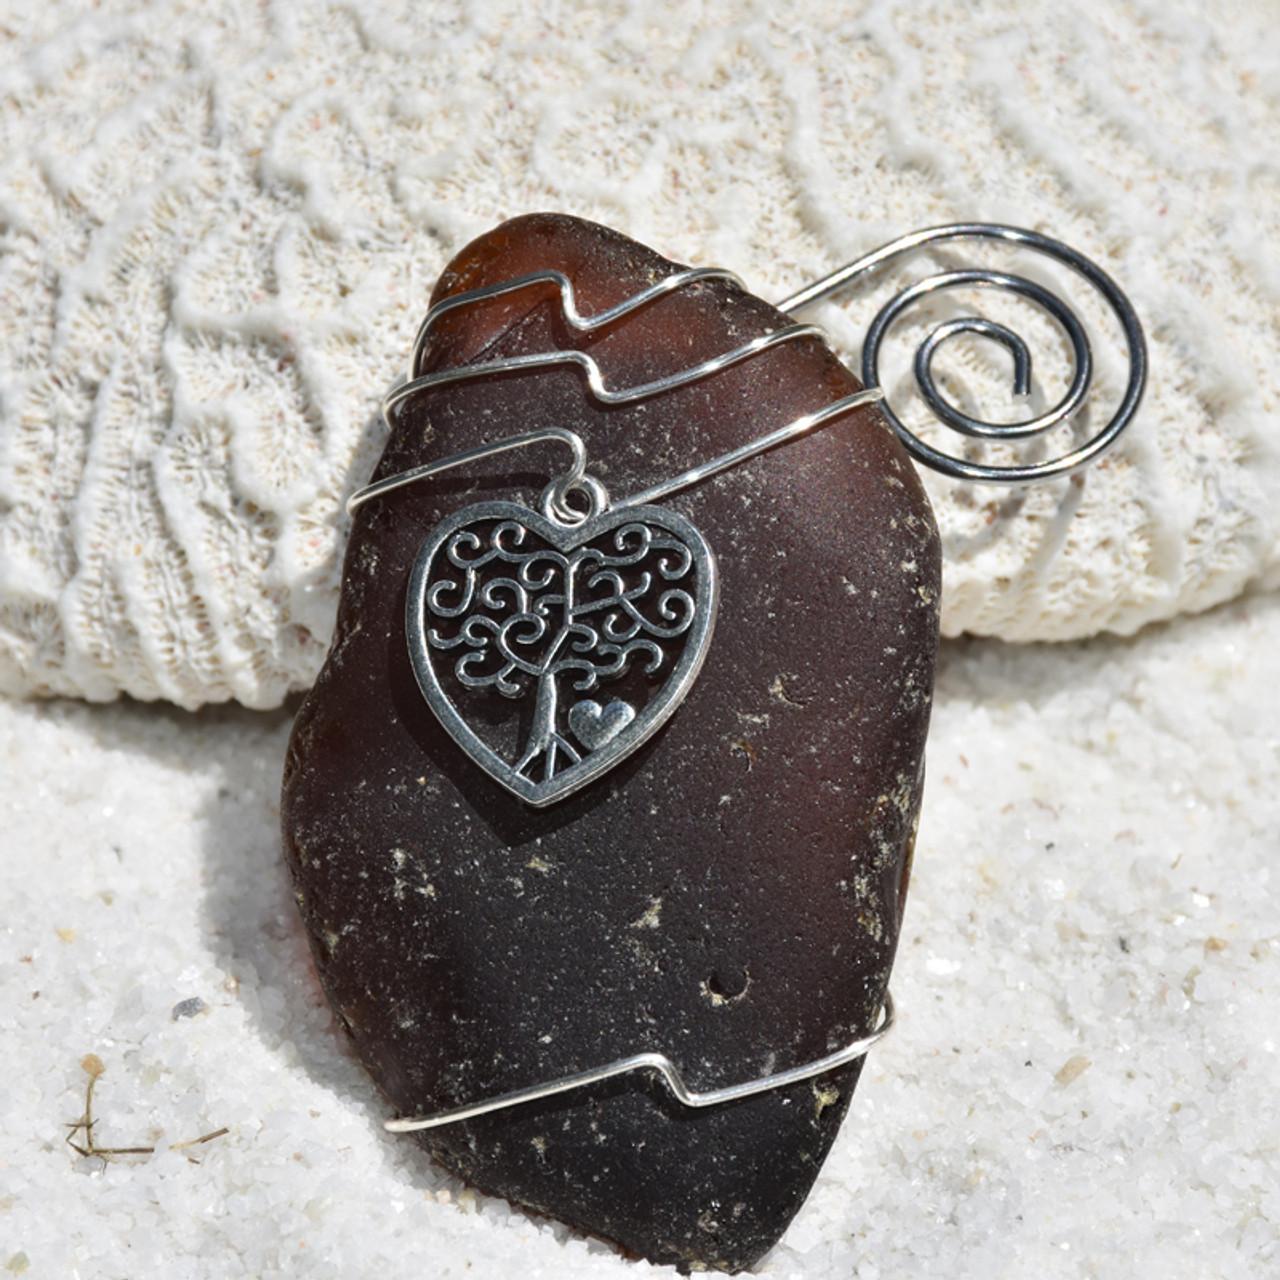 Heart Tree Ornament